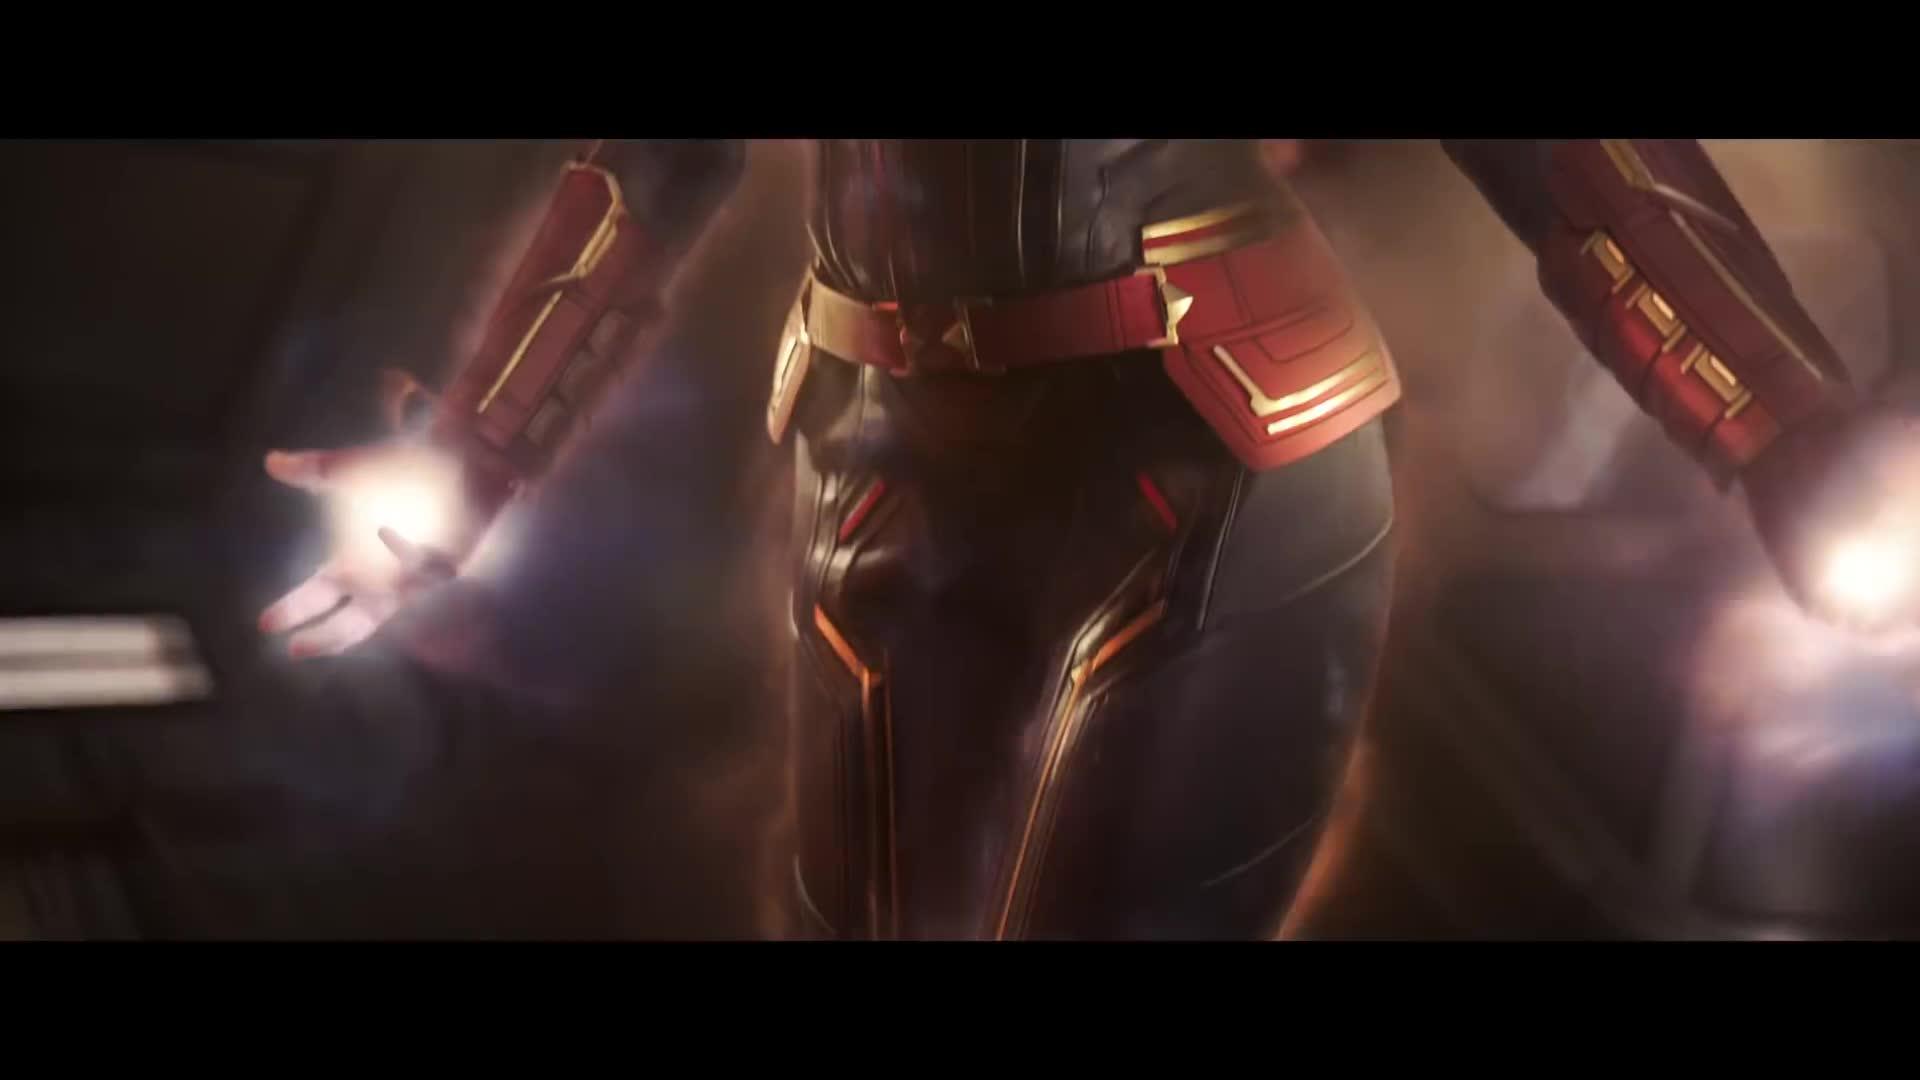 brie larson, captain marvel, clark gregg, comics, jude law, marvel, marvel studios, mcu, samuel l. jackson, super hero, Marvel Studios' Captain Marvel - Official Trailer GIFs